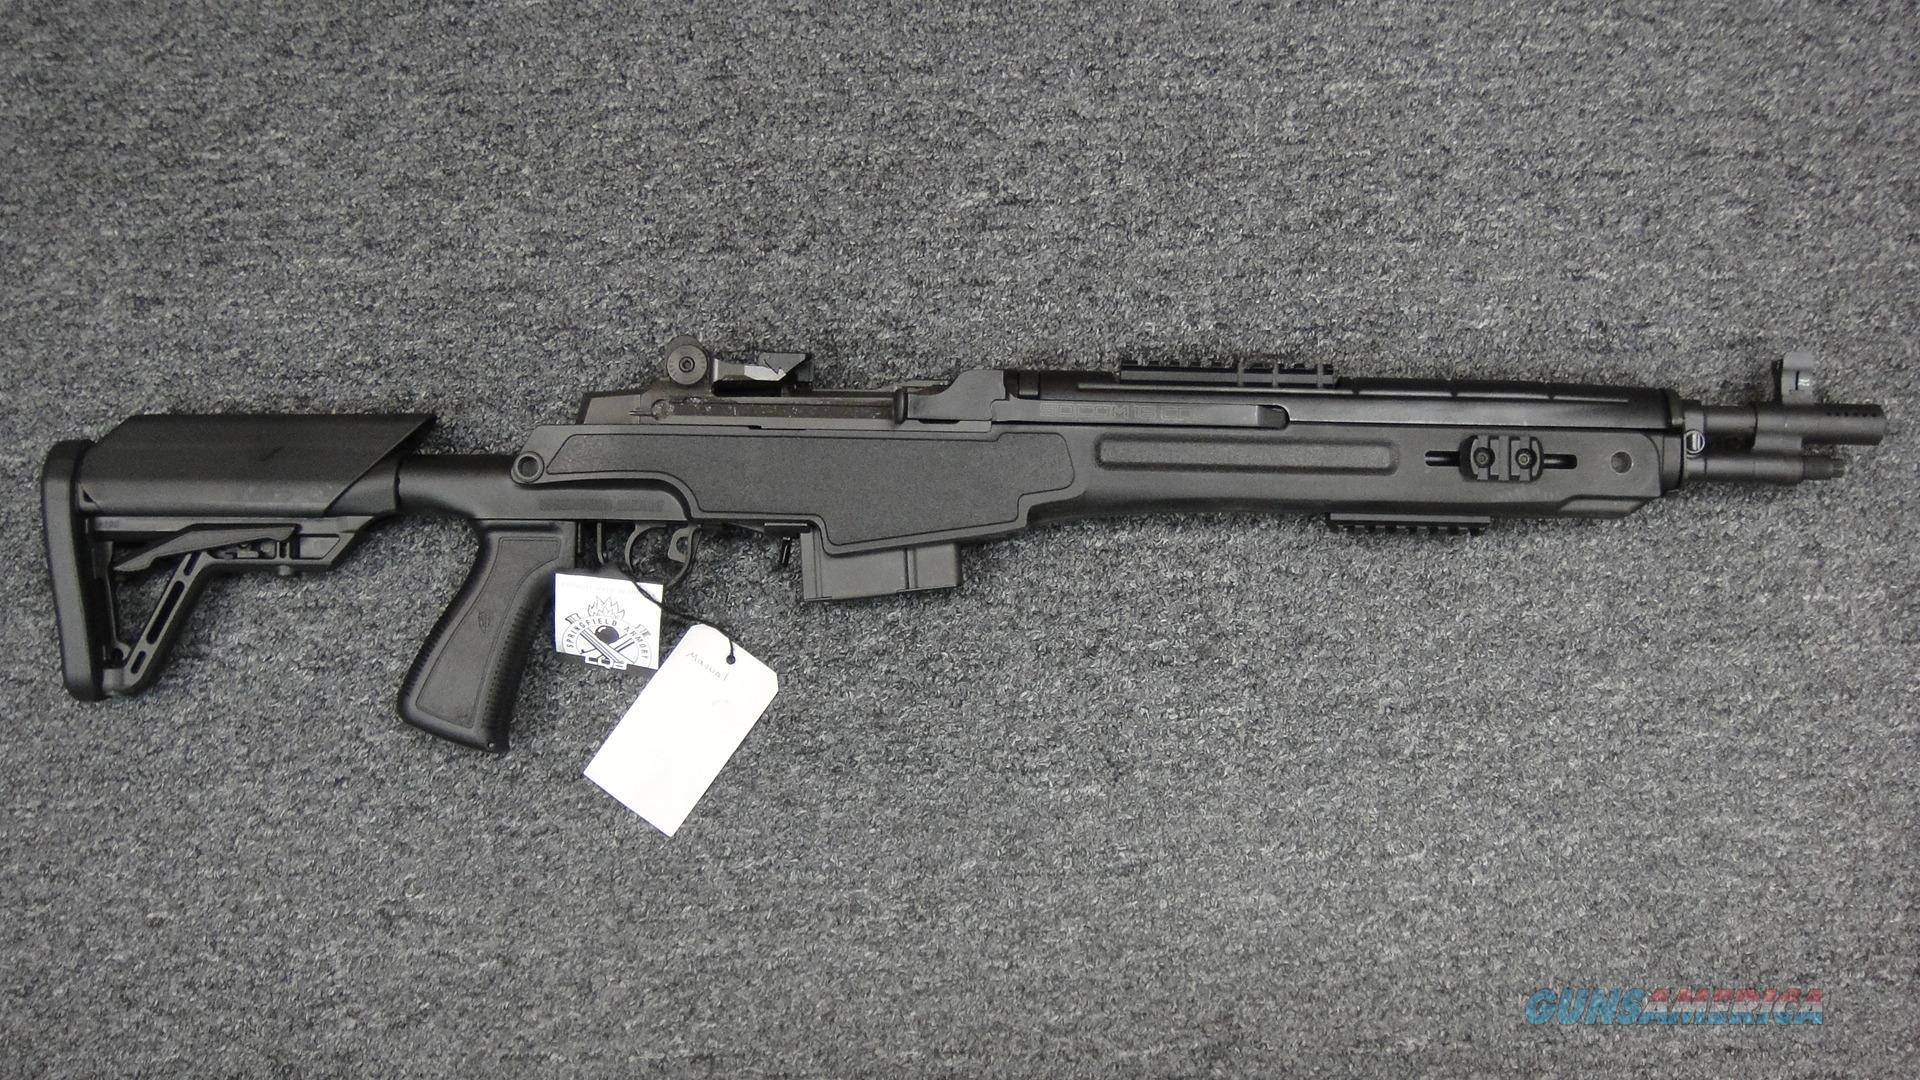 Socom-16 M14 Related Keywords & Suggestions - Socom-16 M14